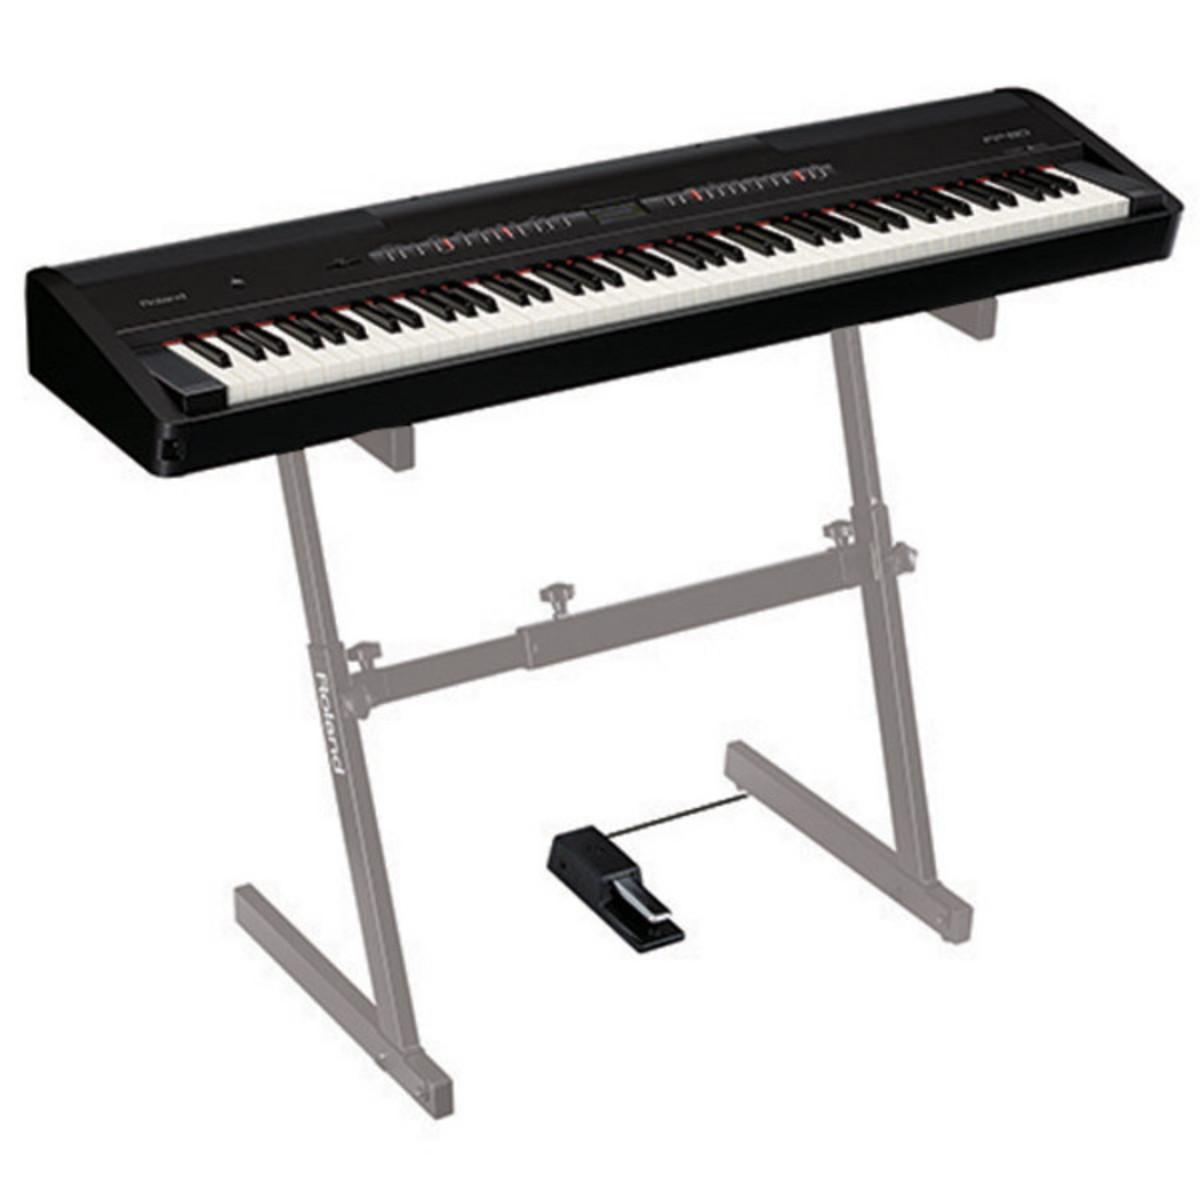 roland fp 80 supernatural digital piano black nearly new at. Black Bedroom Furniture Sets. Home Design Ideas